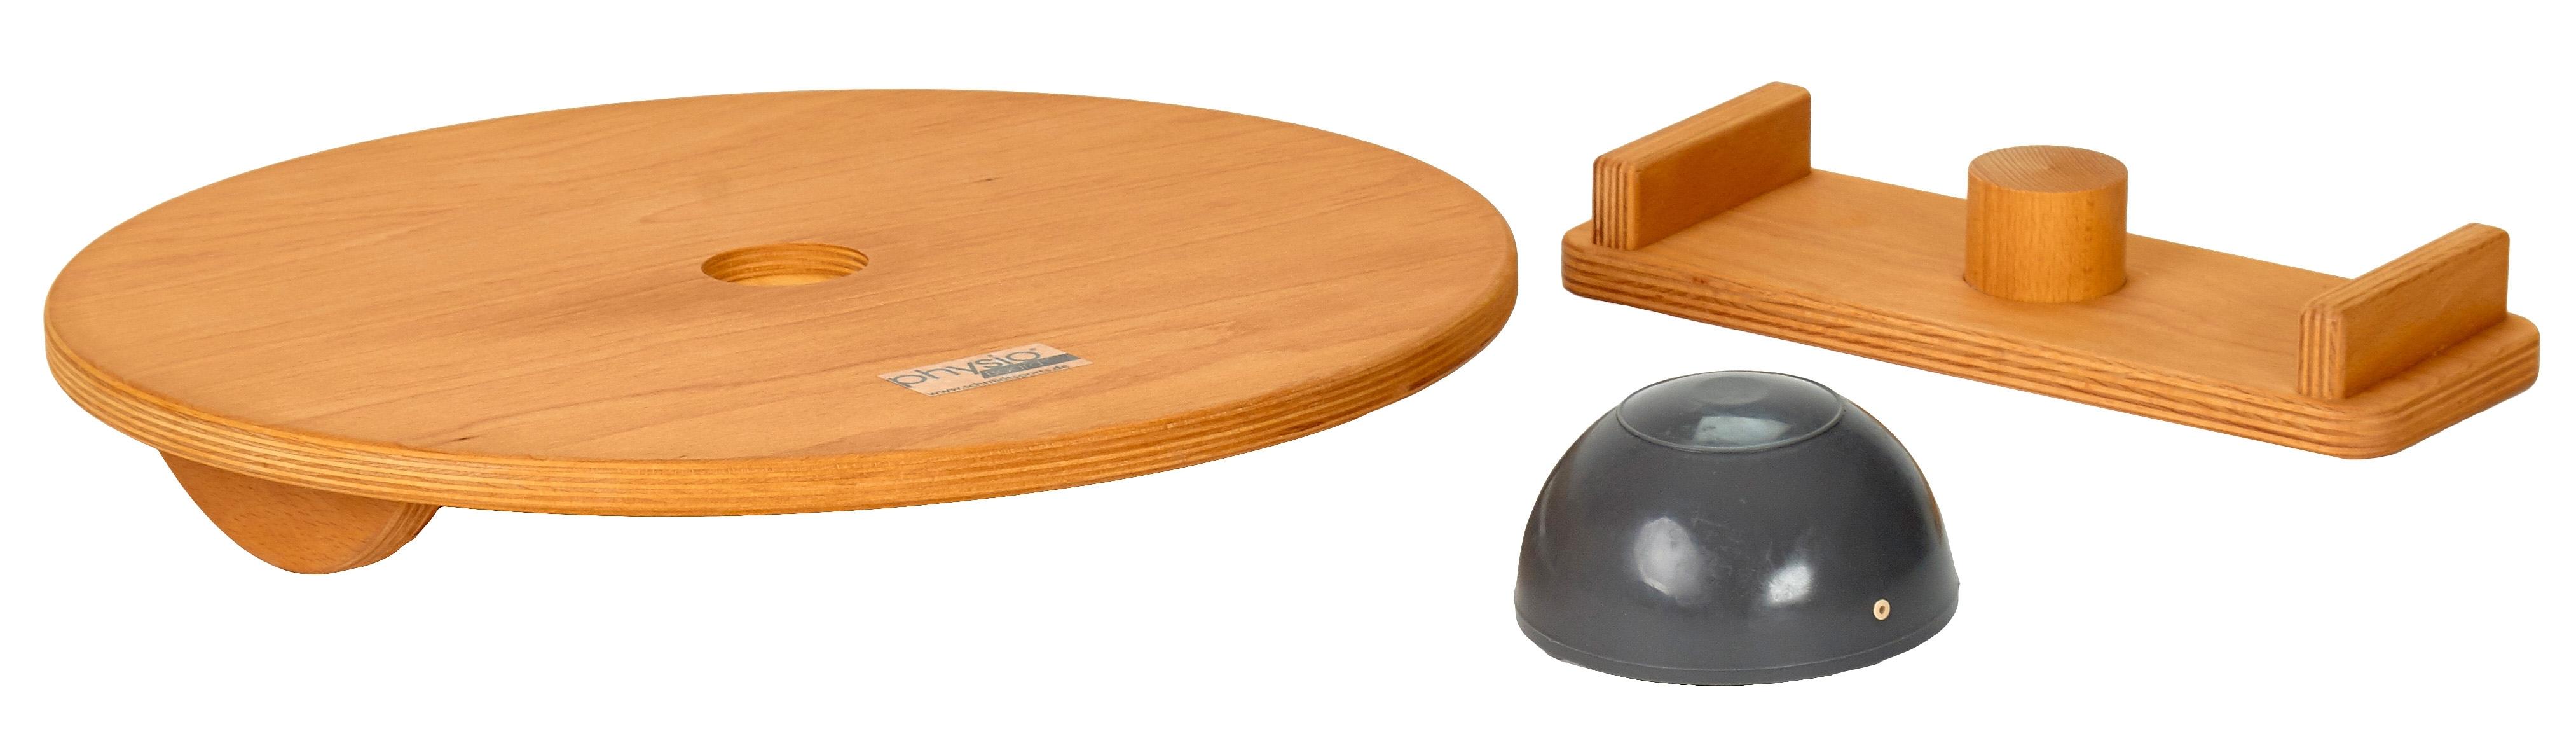 Schmidt Sports Deuser balance board »Physio Board« goedkoop op otto.nl kopen